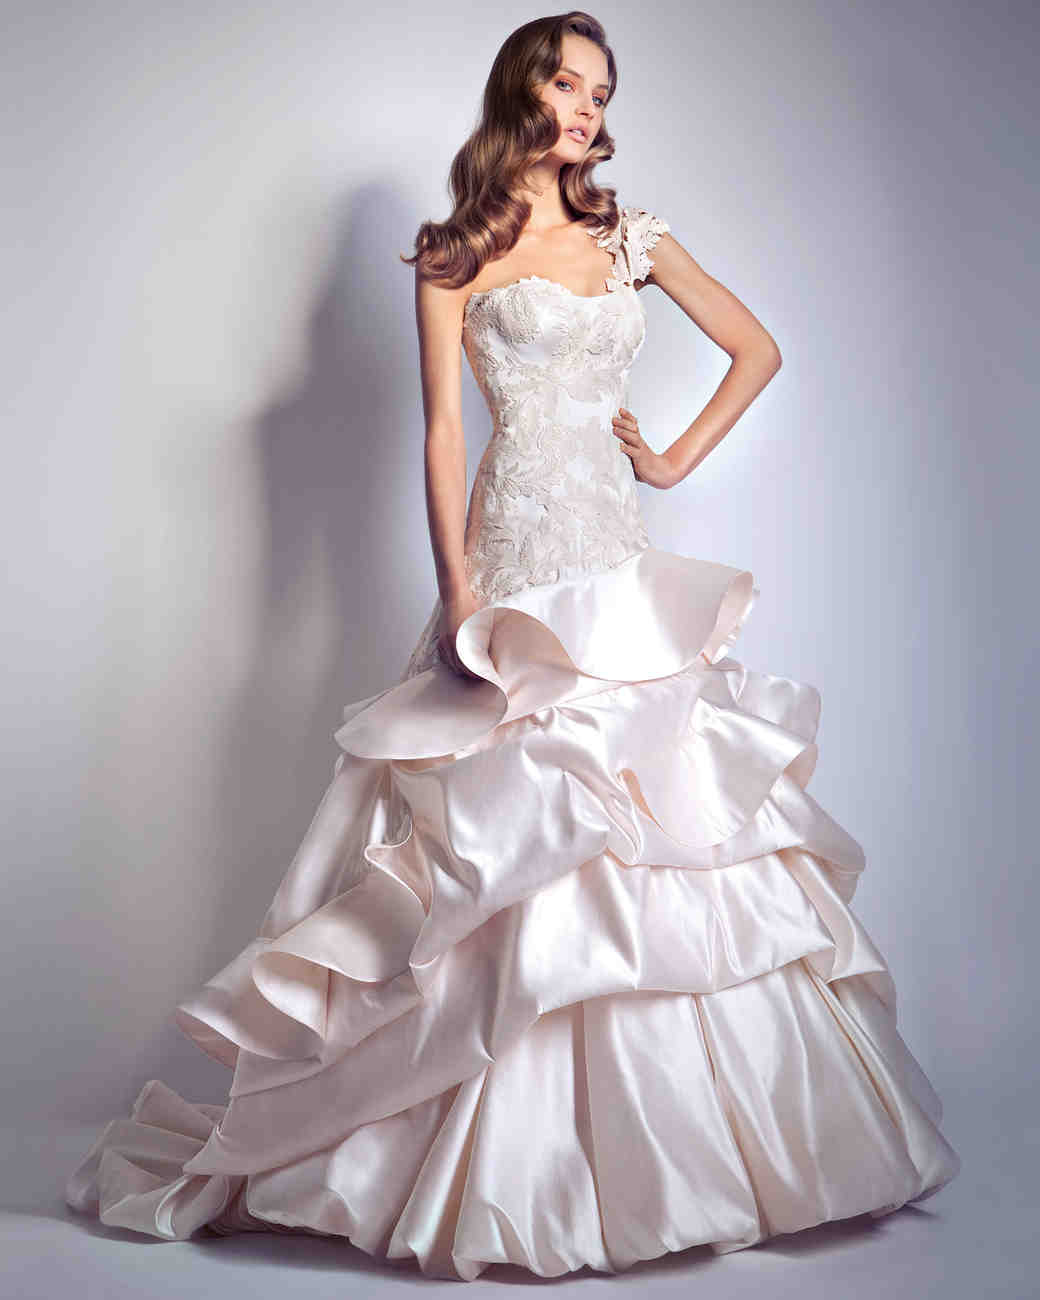 iconic-dresses-marina-k.jpg